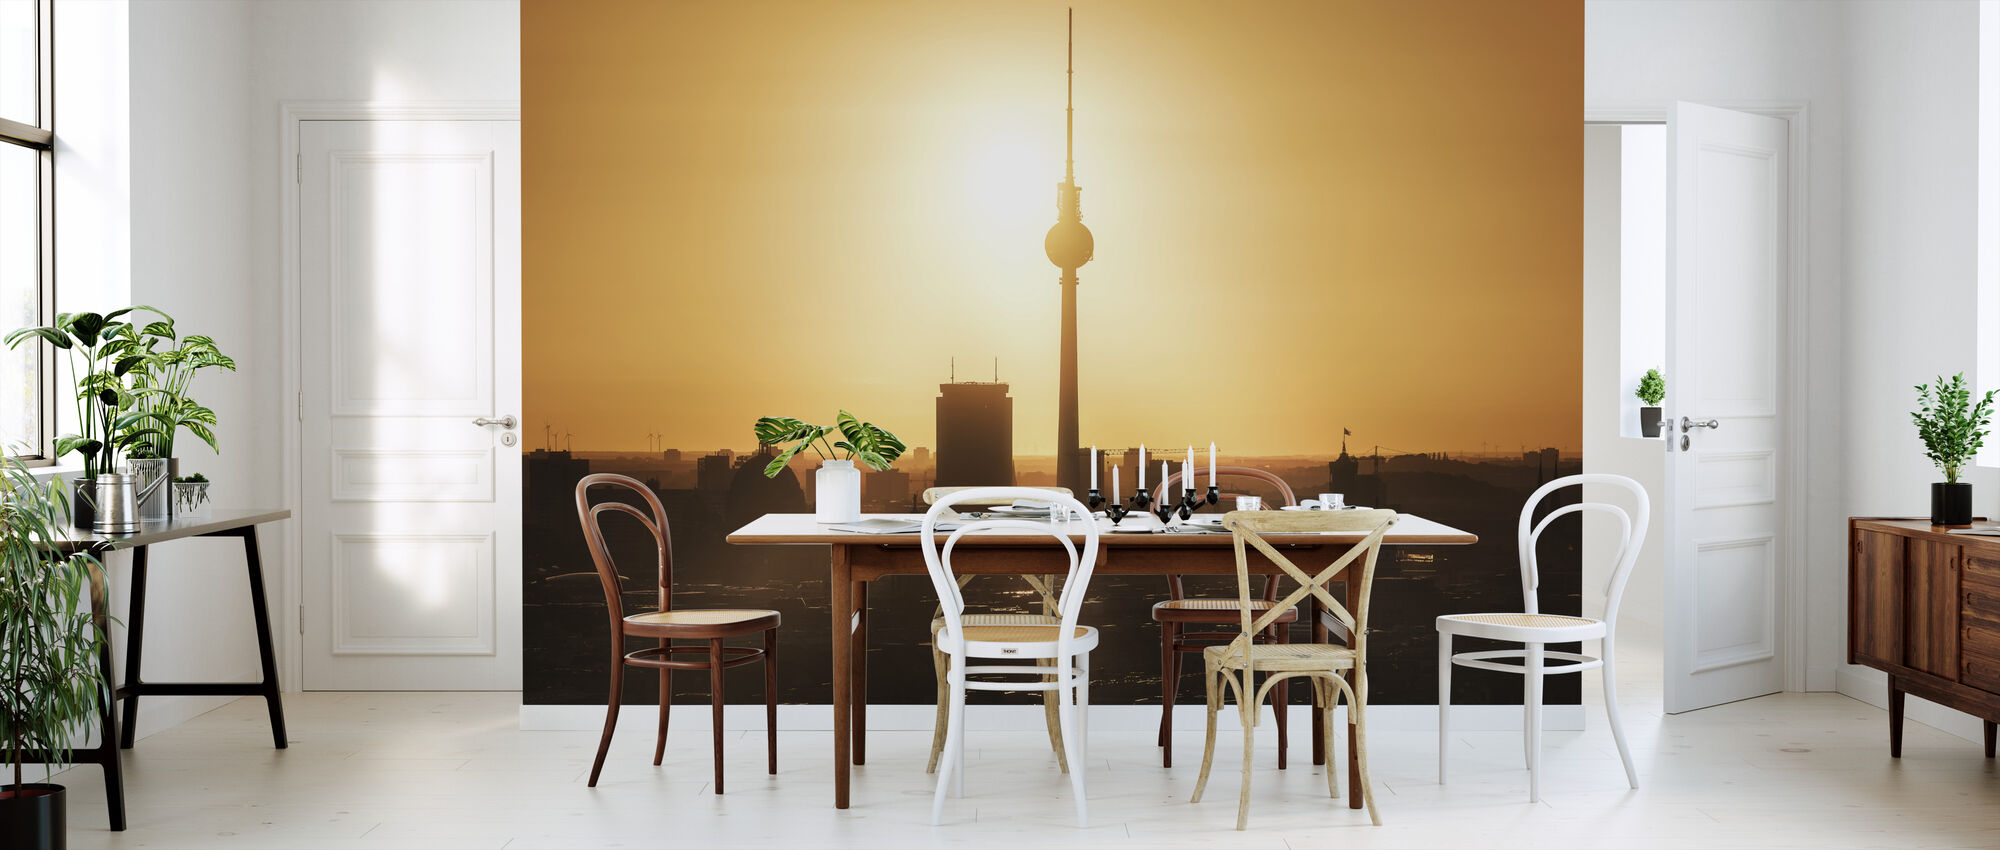 Berlin - Skyline Sunrise - Wallpaper - Kitchen